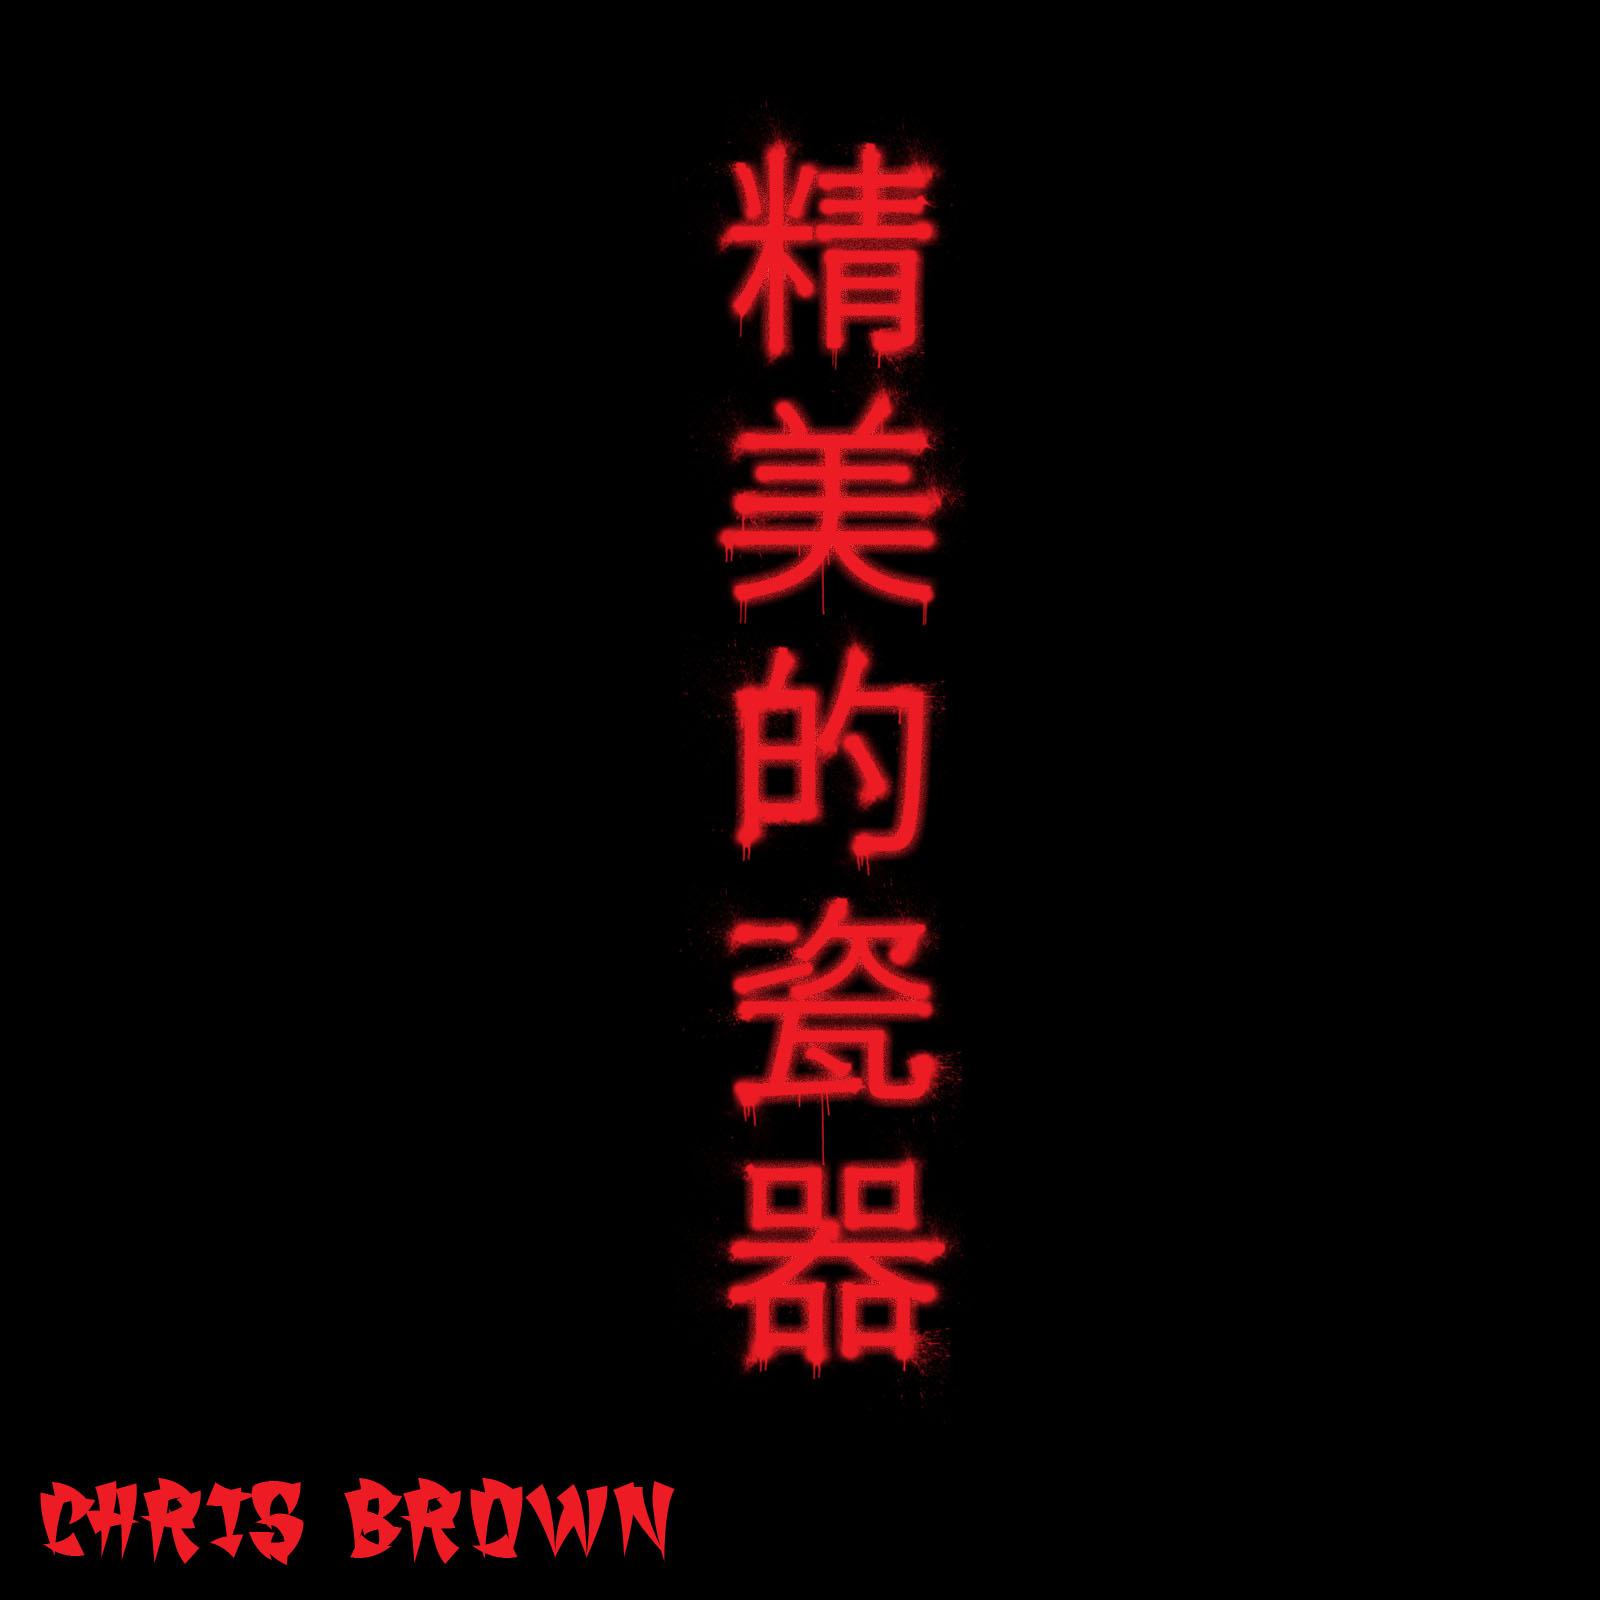 http://2.bp.blogspot.com/-ATWmpm-80Xo/UVmxTFlxZeI/AAAAAAAAVig/SgKJUJ7qIbc/s1600/chris-brown-fine-china.jpg